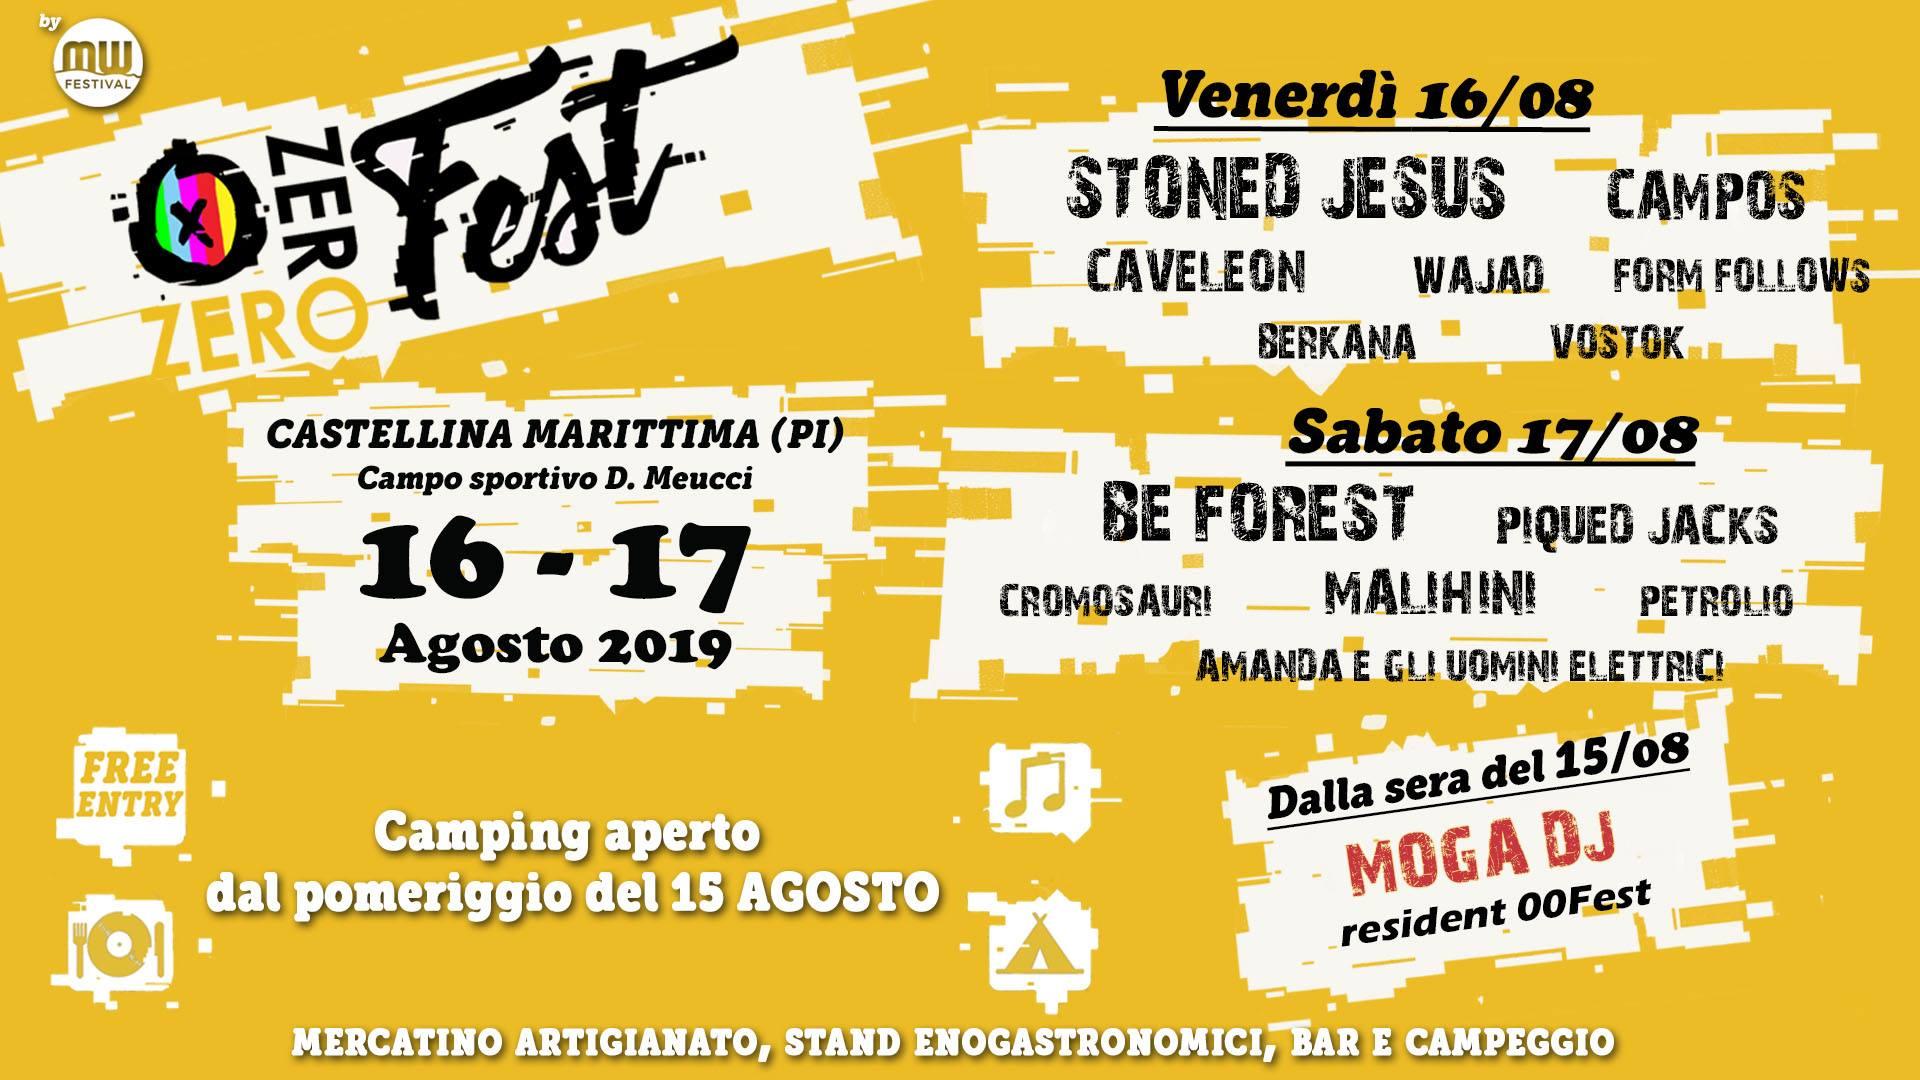 00 Fest – Musica W | Castellina Marittima